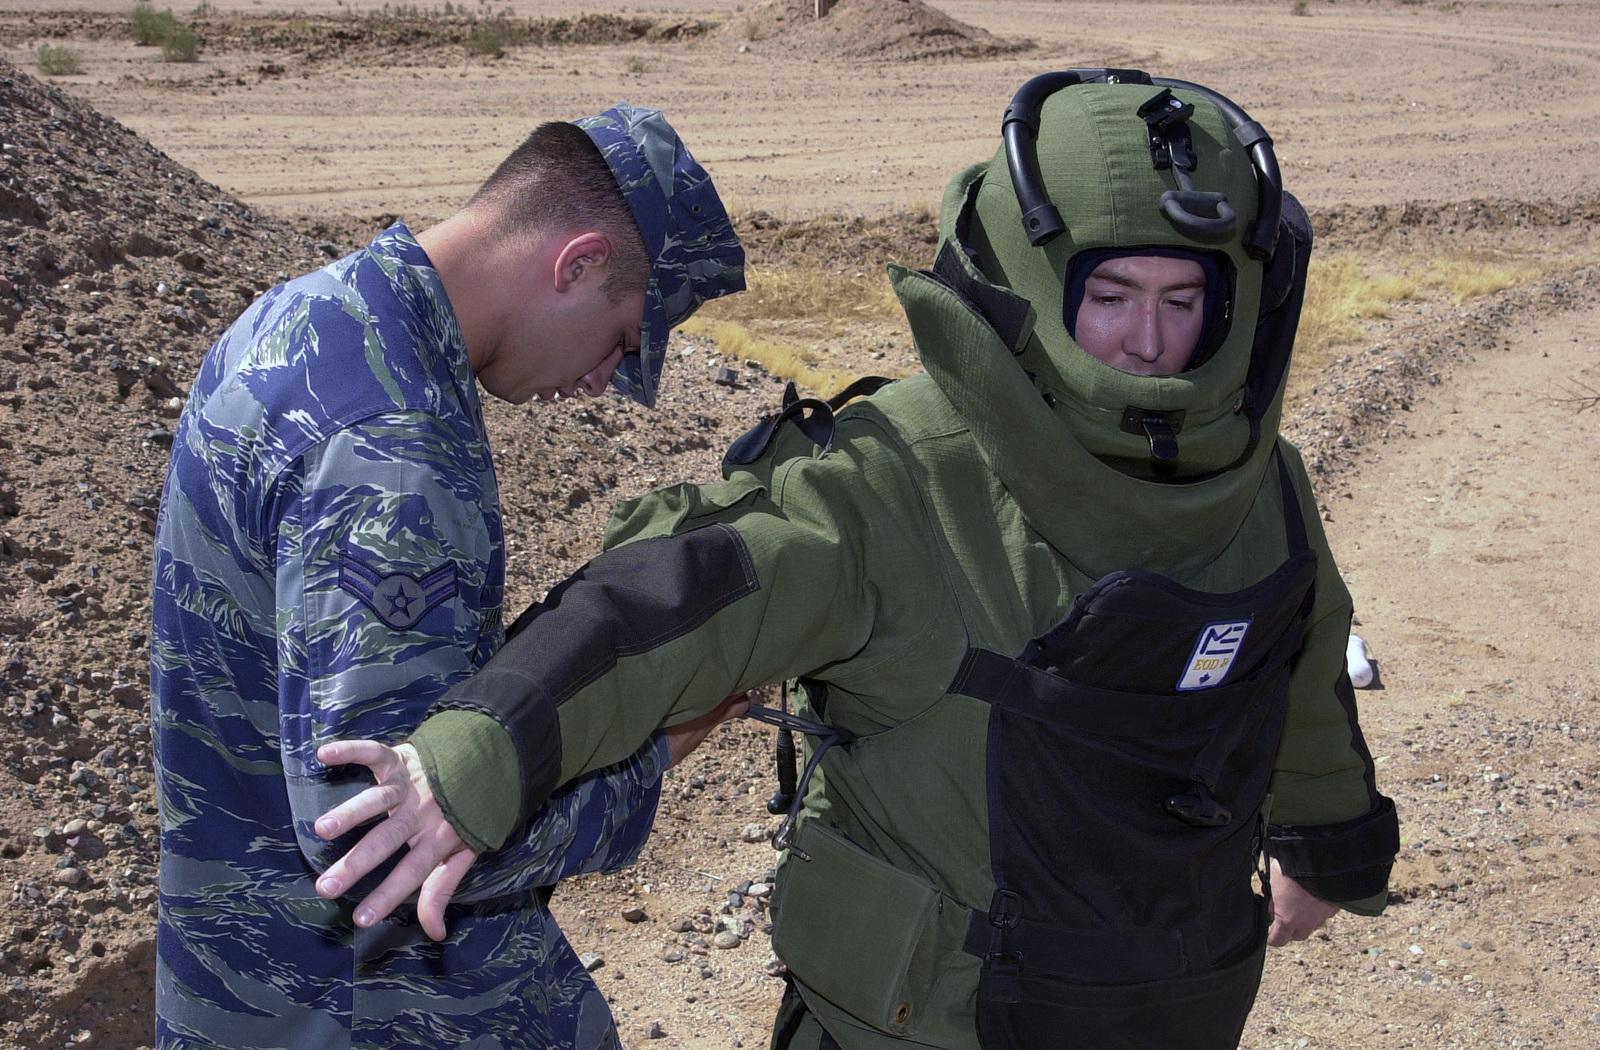 US Air Force (USAF) STAFF Sergeant (SSGT) Aaron Davenport